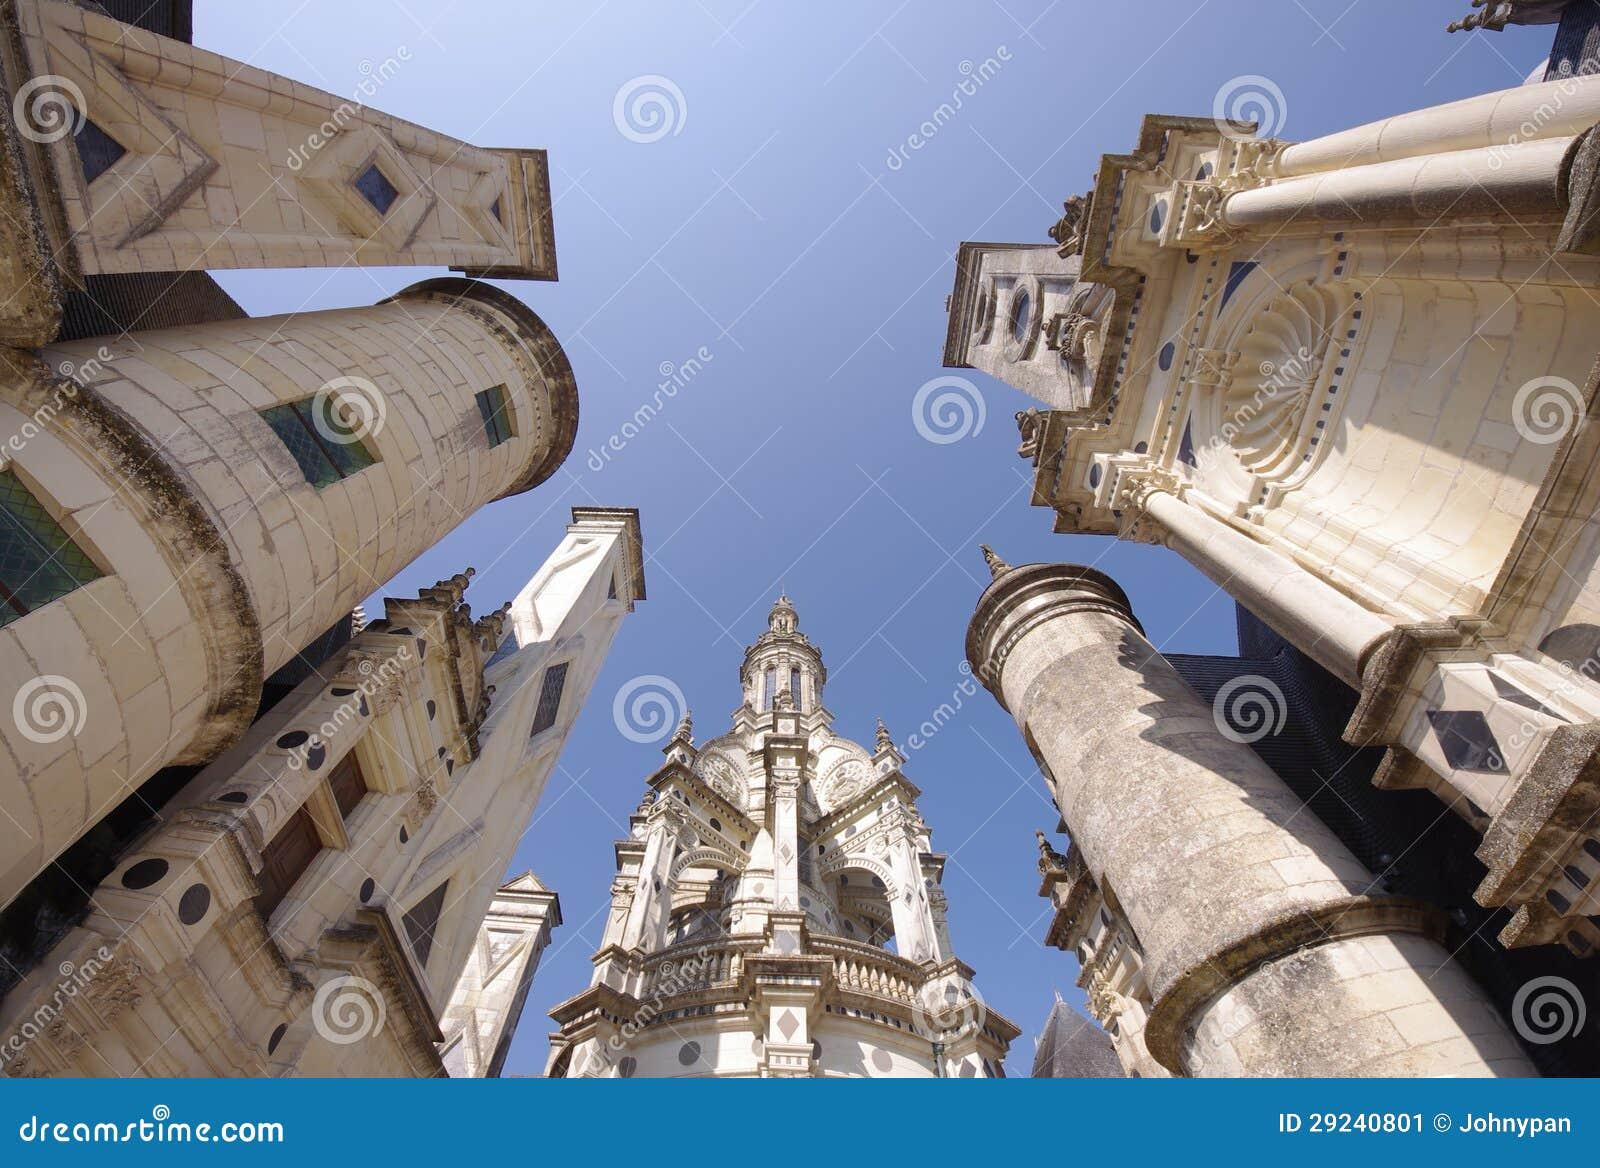 Download Castelo de Chambord imagem de stock. Imagem de exterior - 29240801